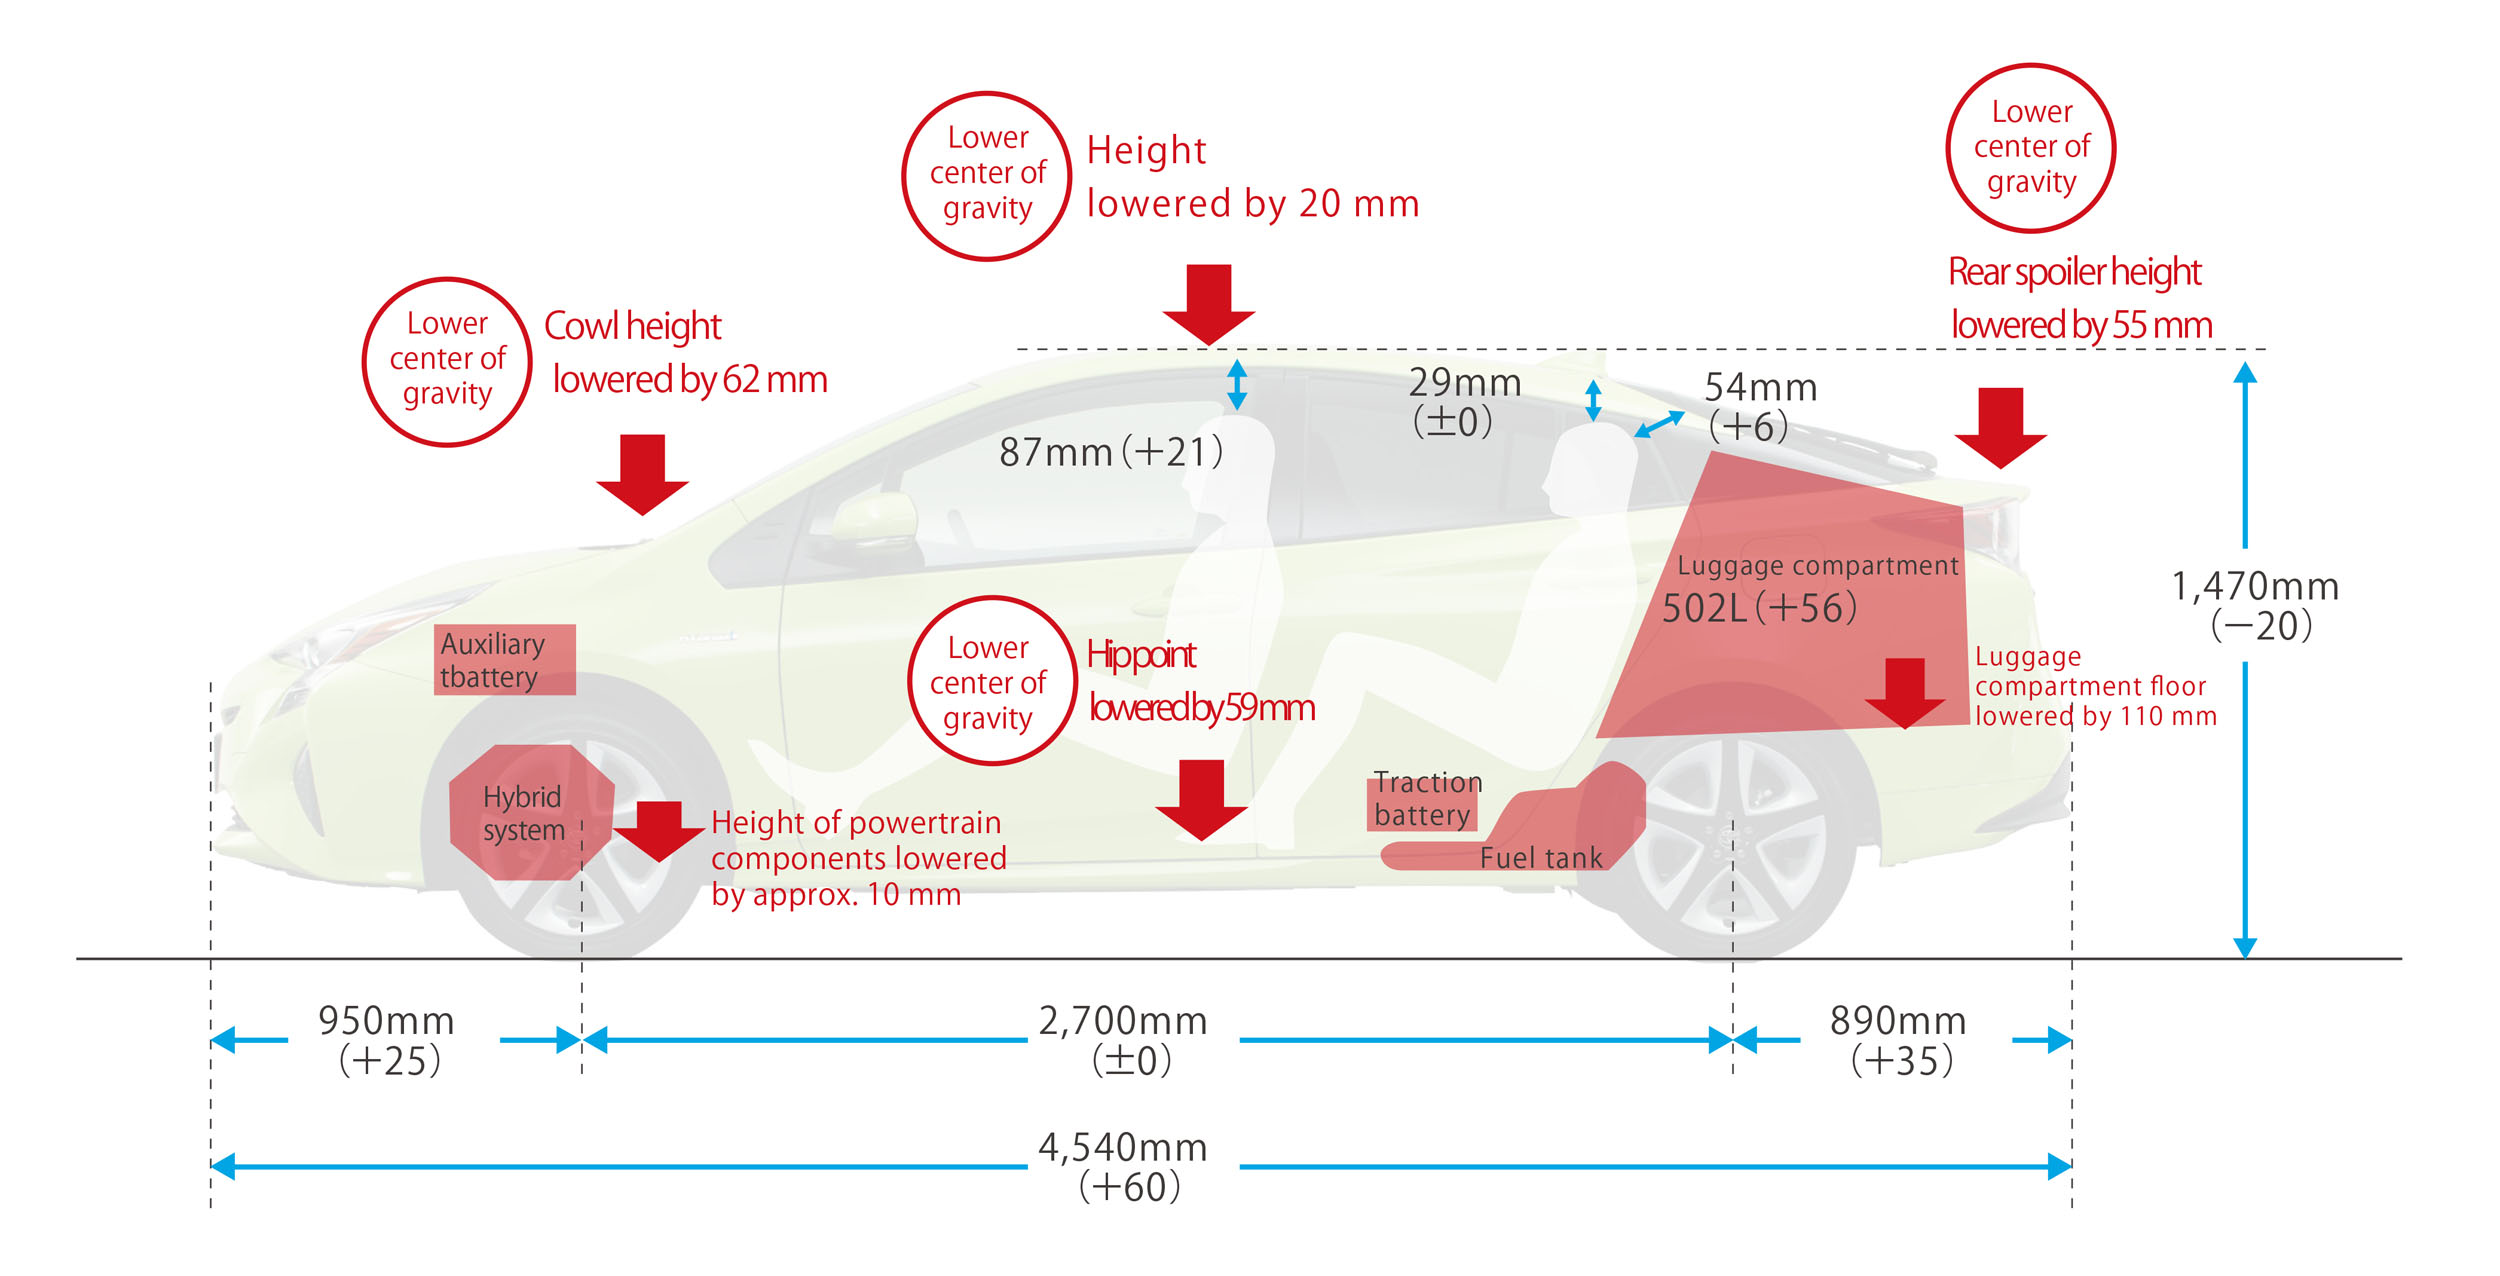 2016 Toyota Prius Specs Revealed 40 Km L Target Fc Paul Tan Image 391844